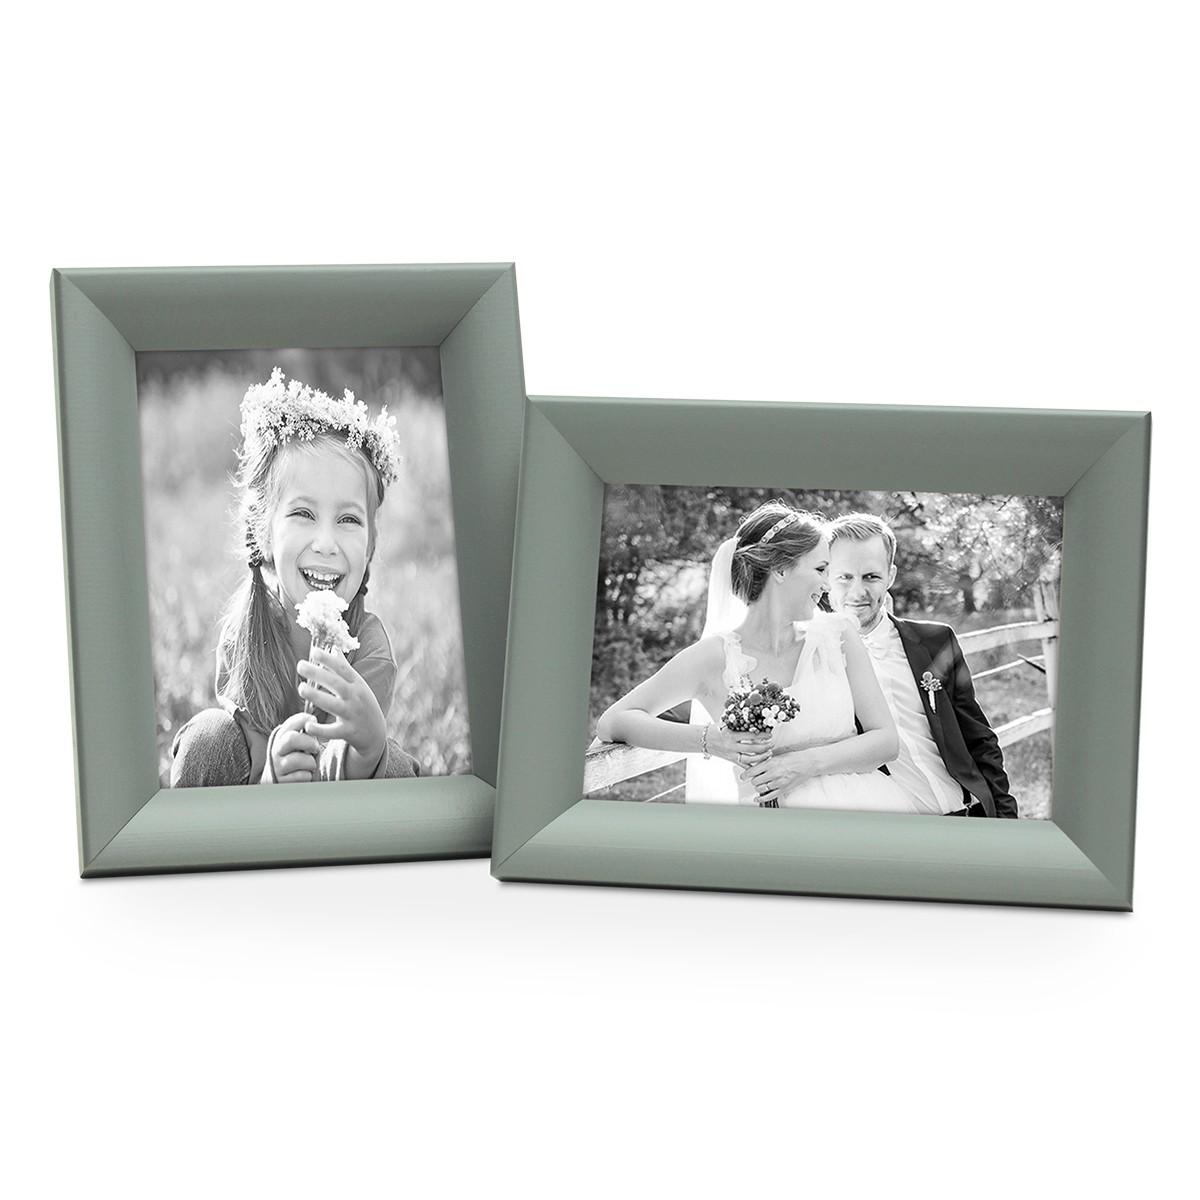 2er set bilderrahmen landhaus stil grau 15x20 cm holz rahmen fotorahmen portraitrahmen. Black Bedroom Furniture Sets. Home Design Ideas